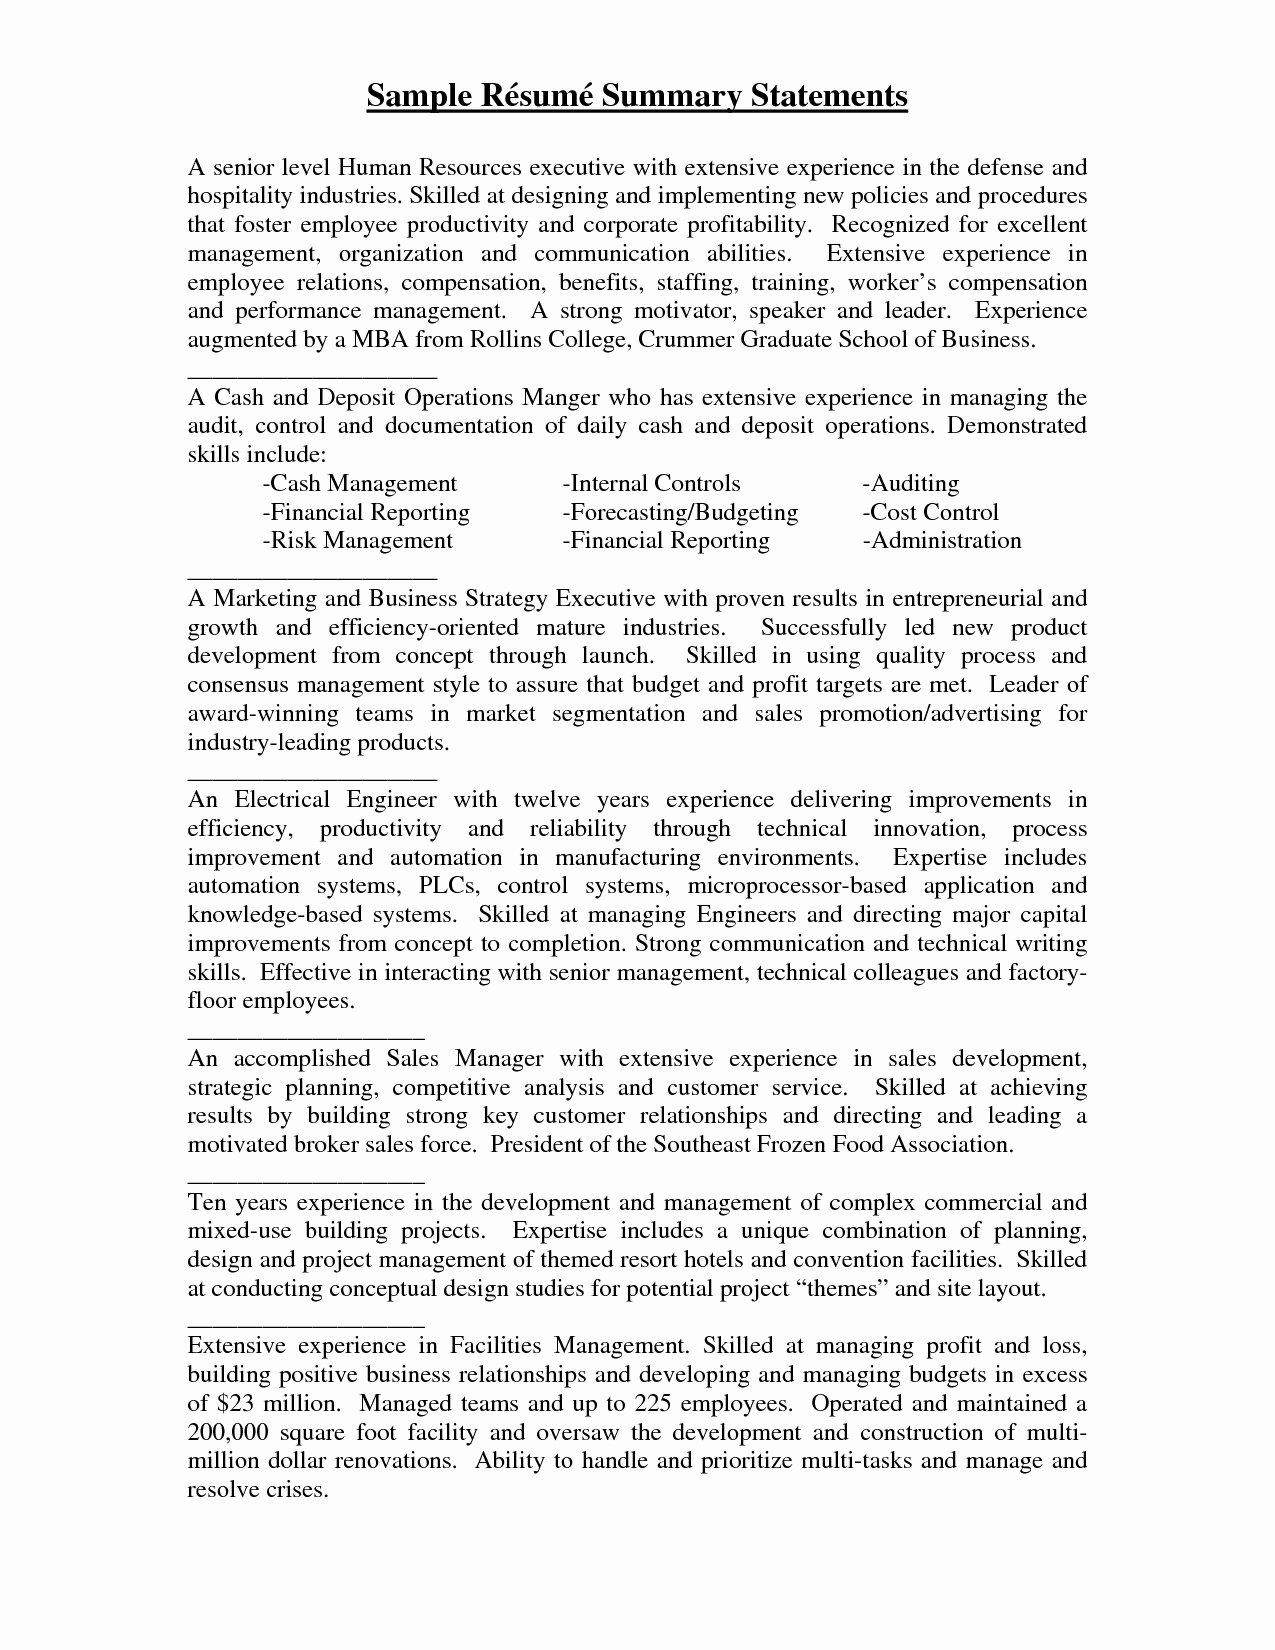 Summary Resume Examples Resume Summary Statement Example